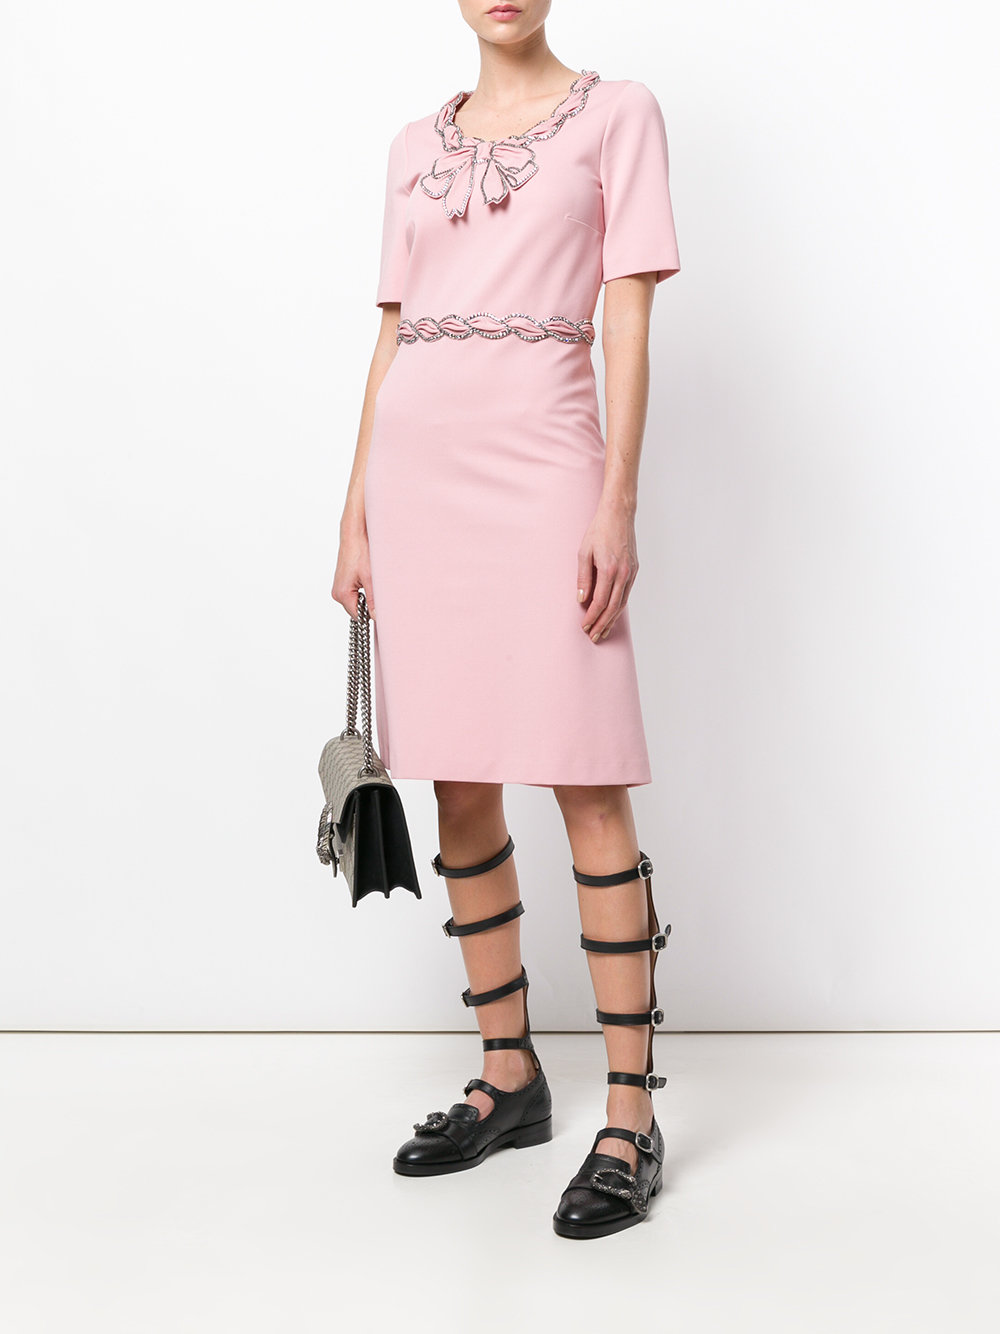 light pink Svarovski crystal emebellishment dress GUCCI |  | 501513-X9M655184